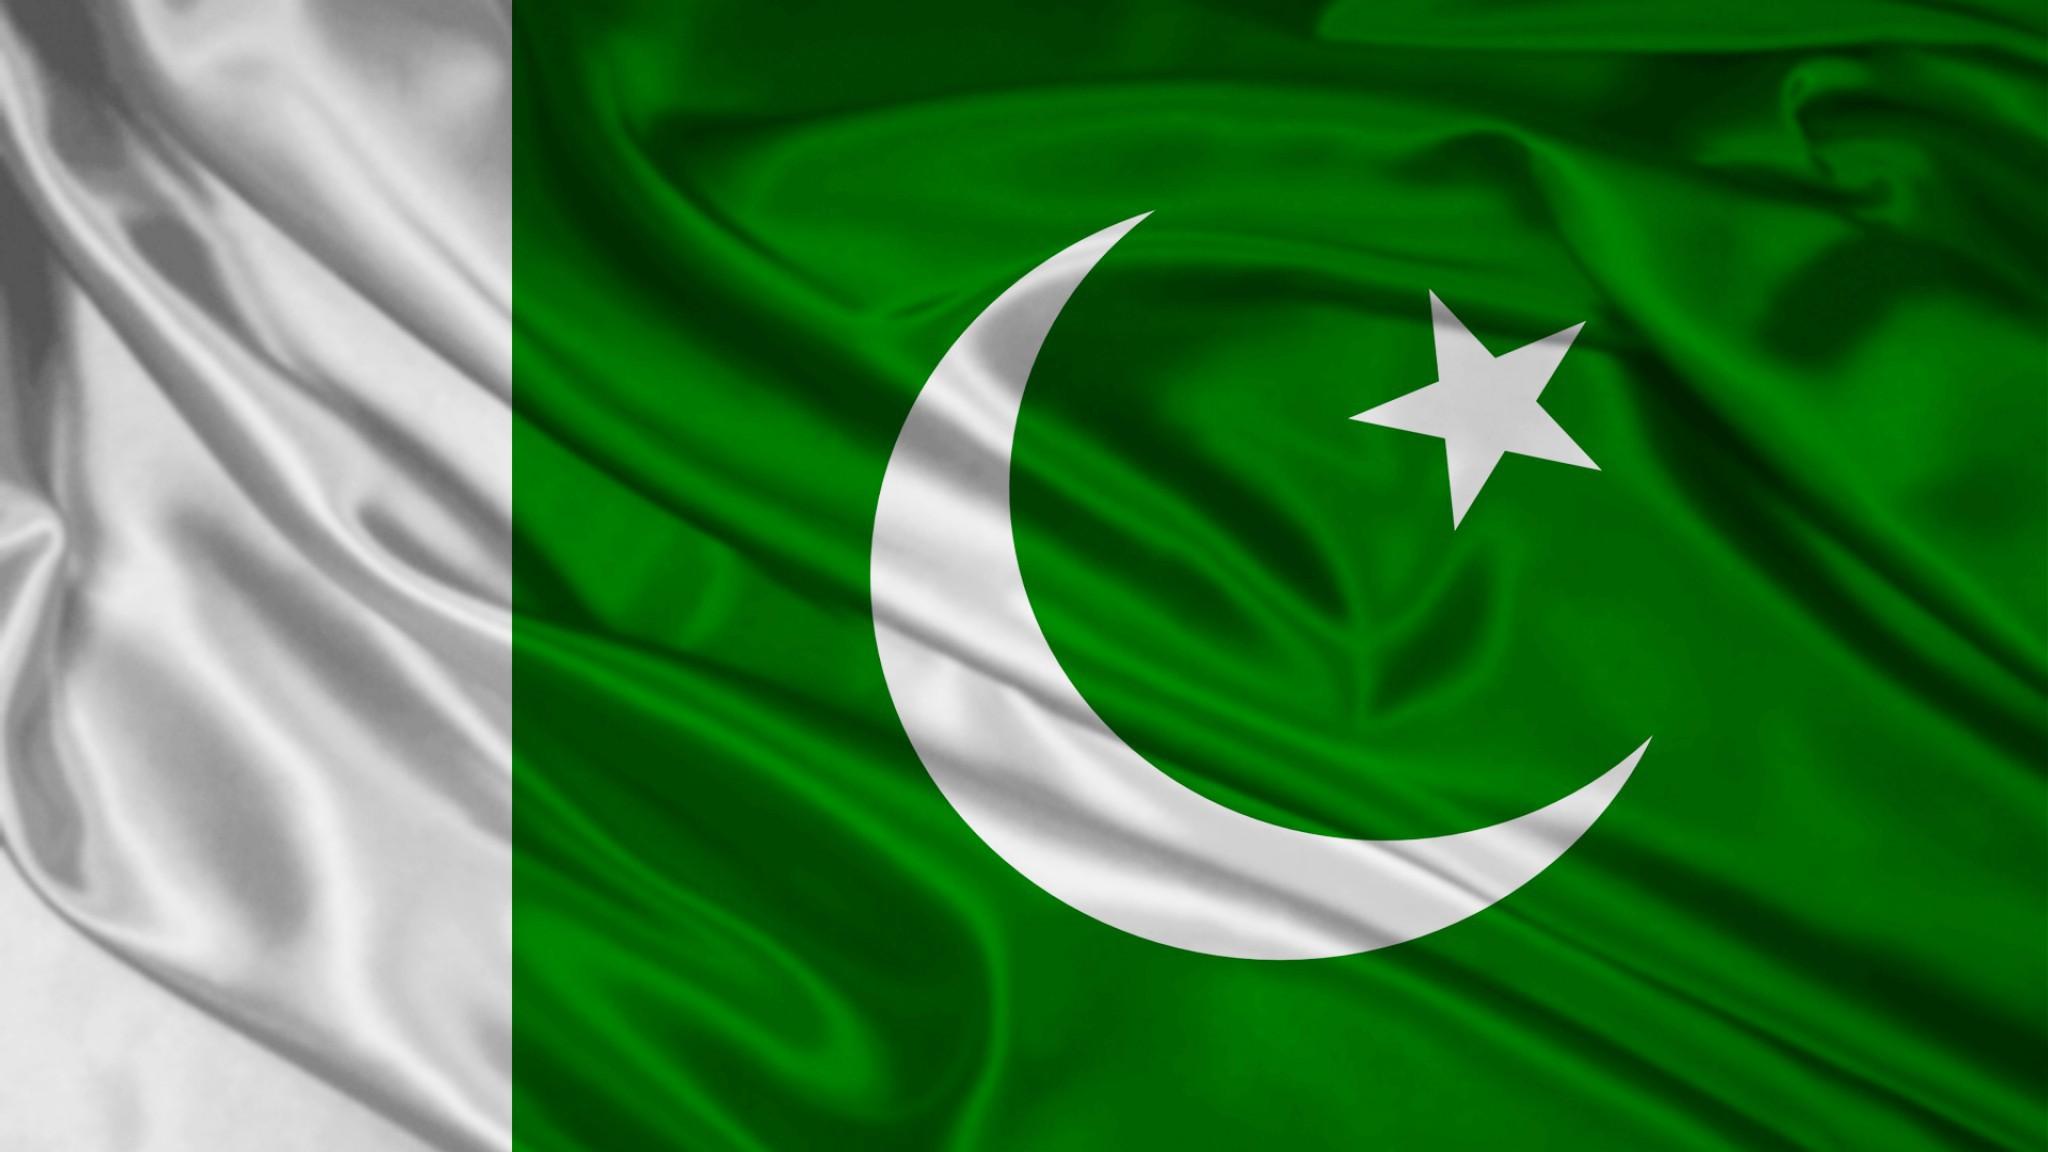 Pakistan Flag Wallpaper 6